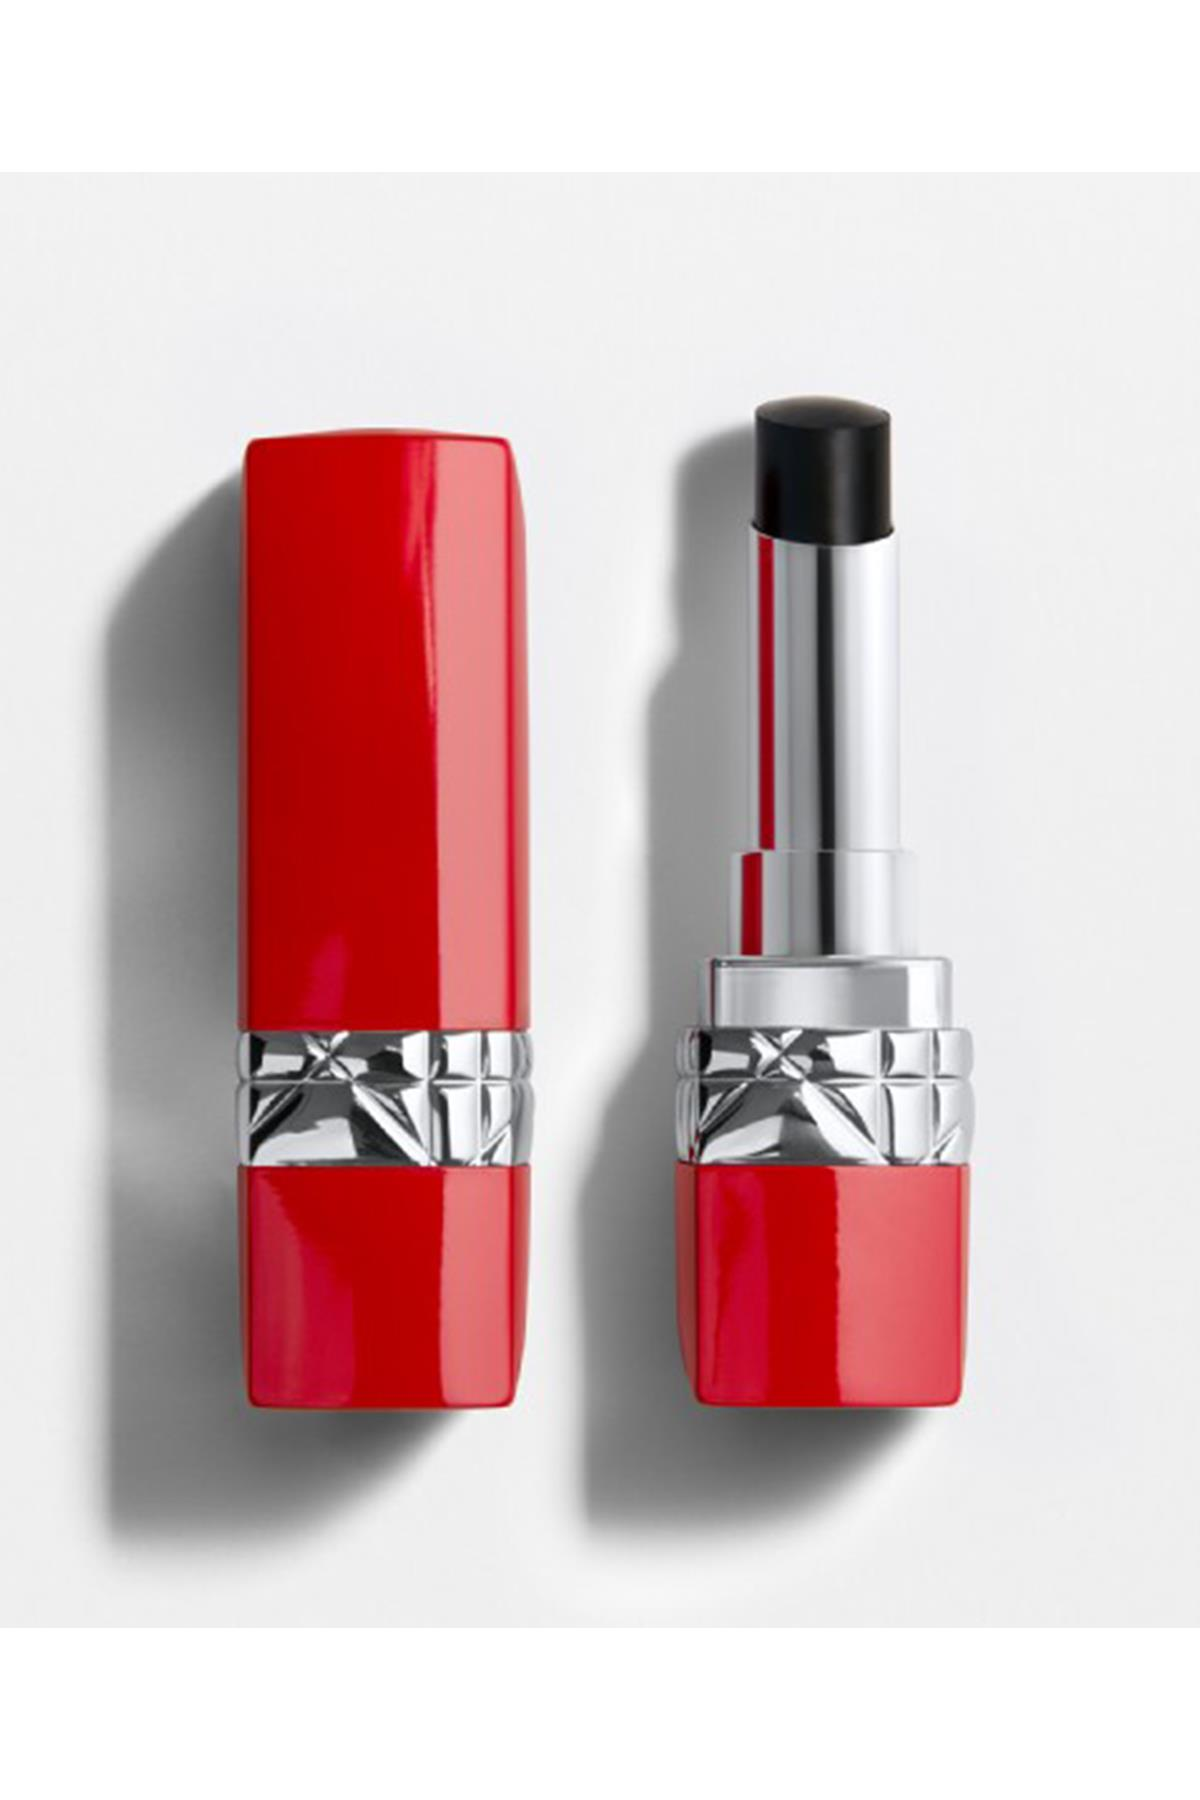 Dior Ultra Rouge 111 Ultra Night 47 Ruj